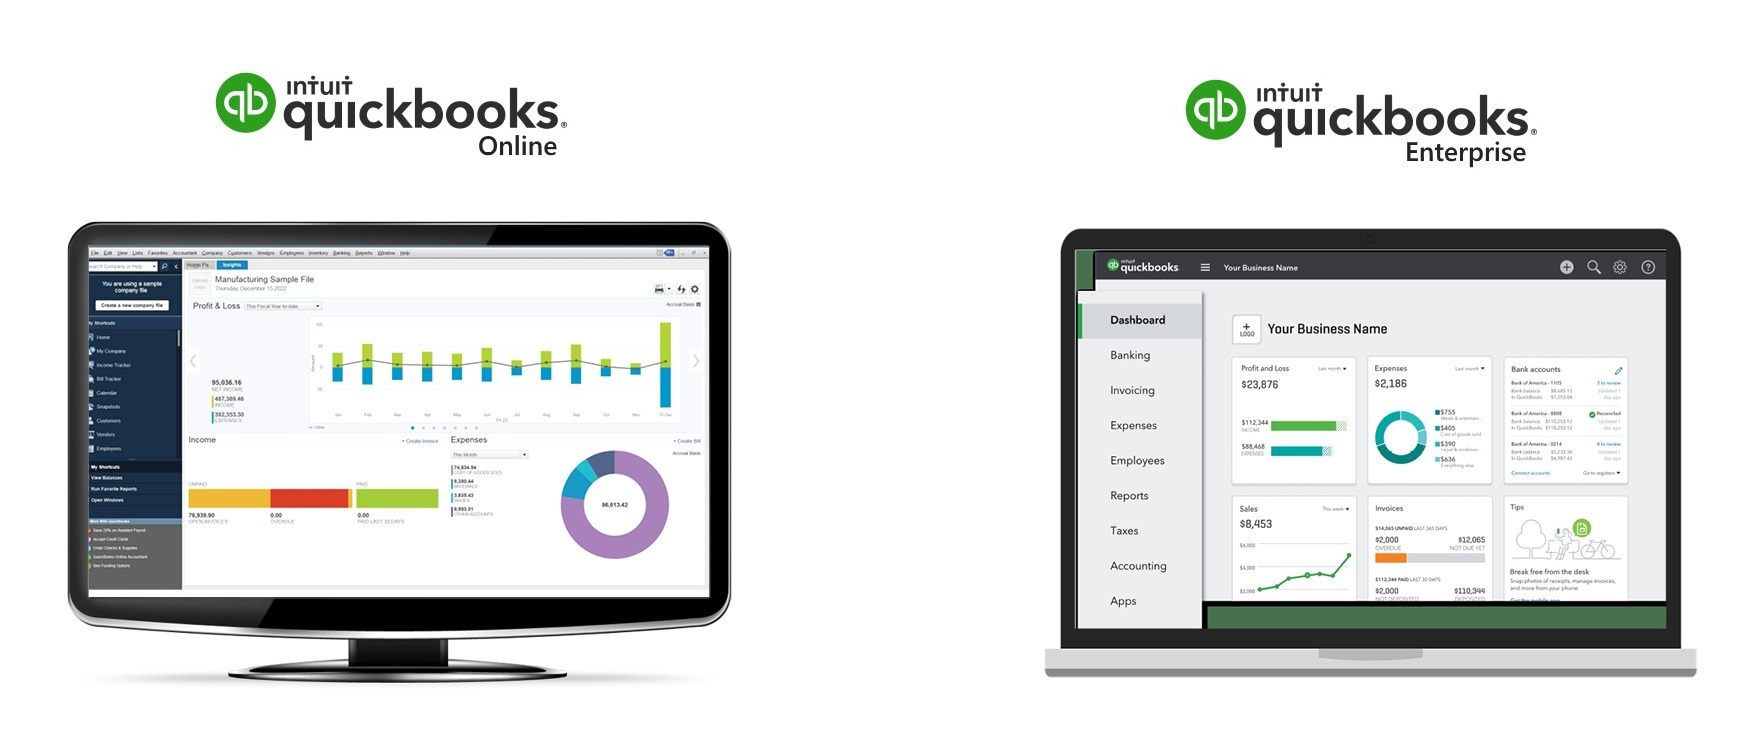 quickbooks logiciel entreprise comptabilite